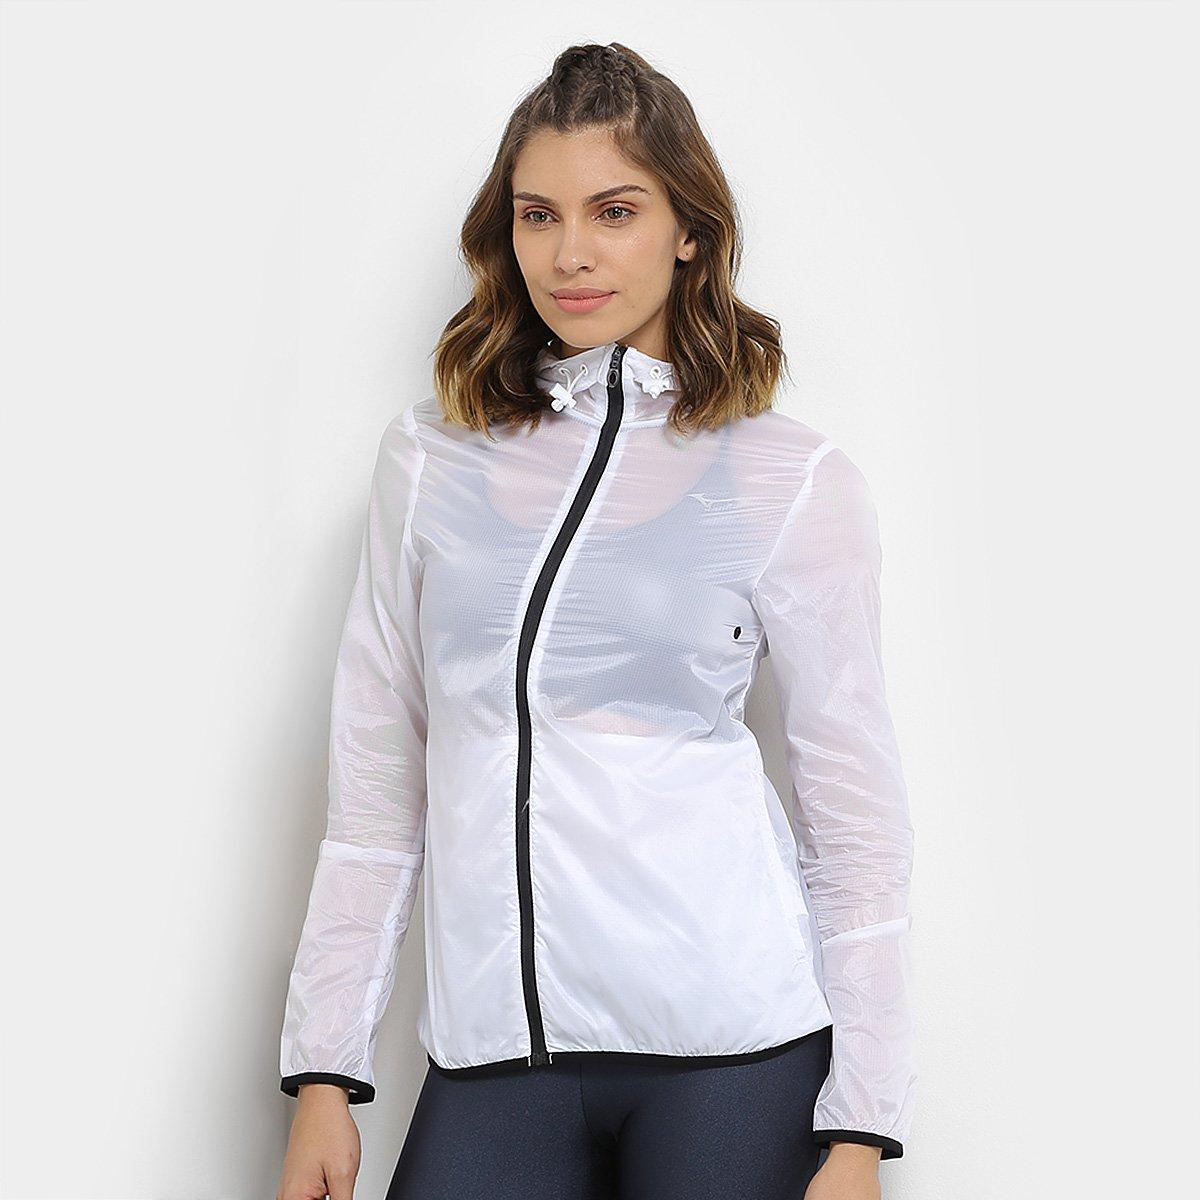 Jaqueta Mizuno Run Fast Feminina - Branco e Preto - Compre Agora ... fecb5d5de2152